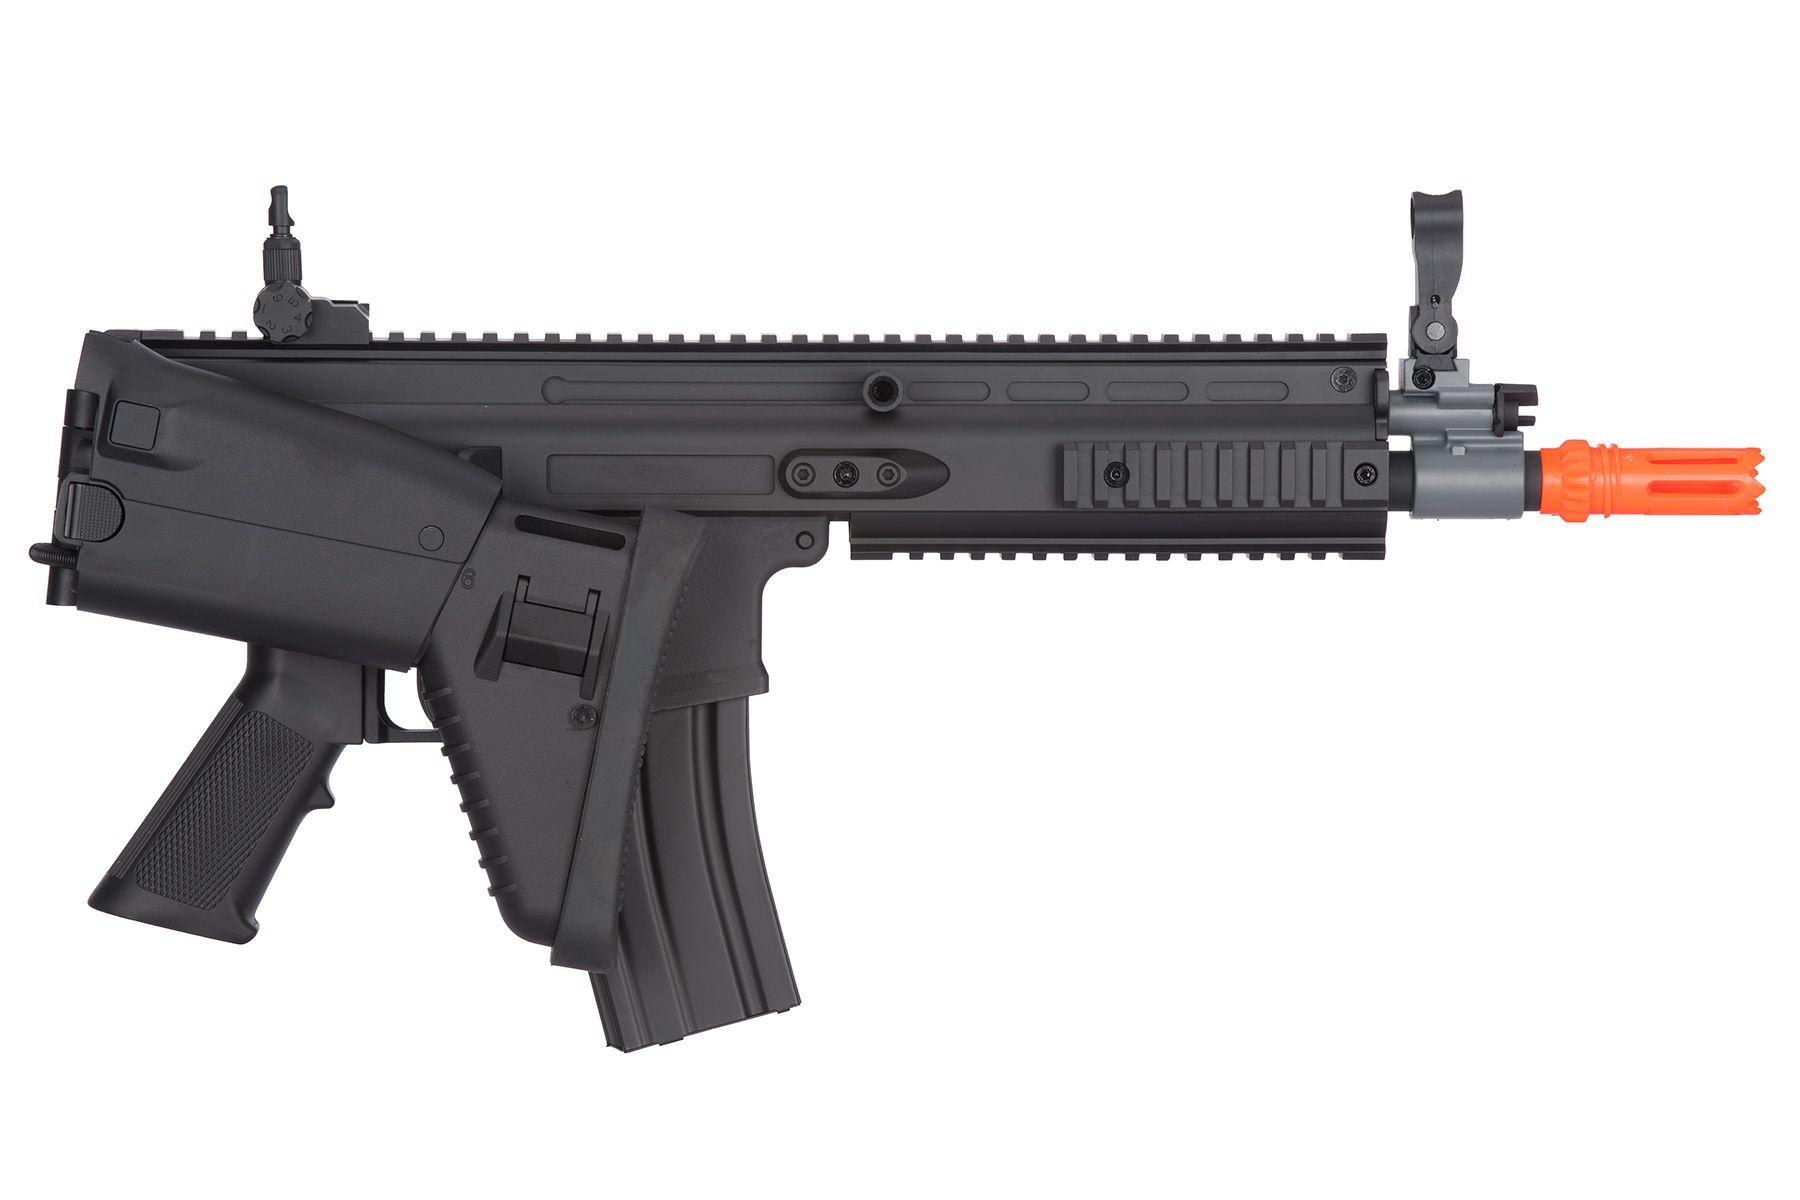 Rifle Airsoft FN SCAR-L Cybergun Black FN Herstal - FRETE GRÁTIS